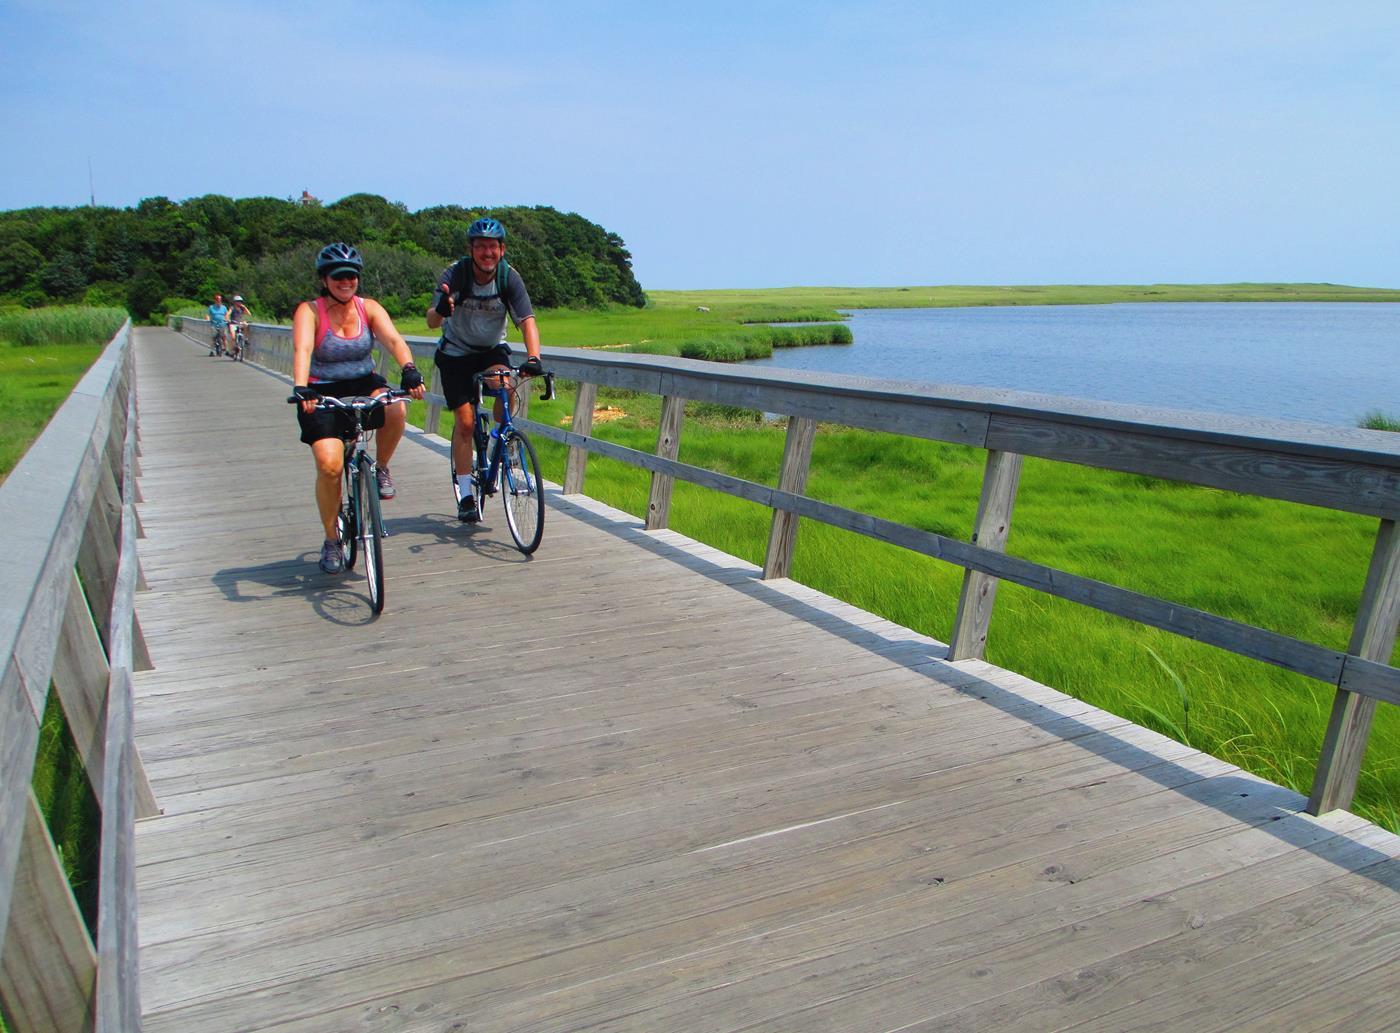 cape cod bike tour 9 great freedom adventures